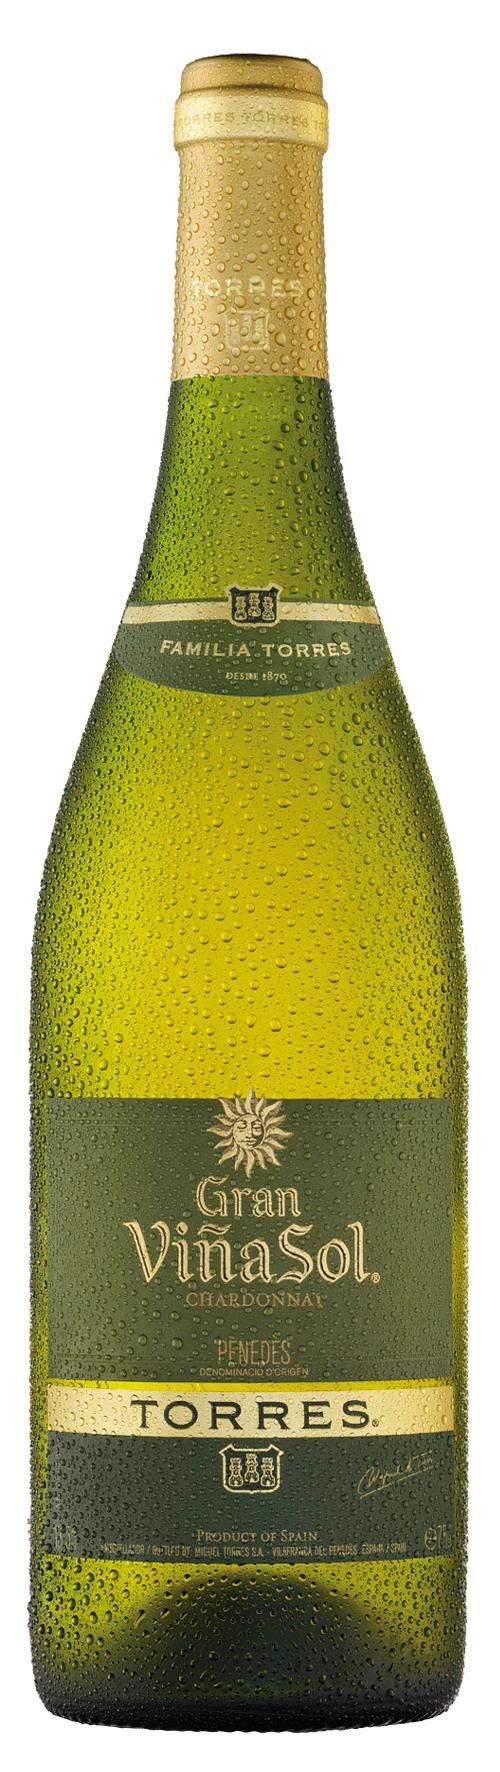 2015 Gran Vina Sol Chardonnay Miguel Torres DO Penedès